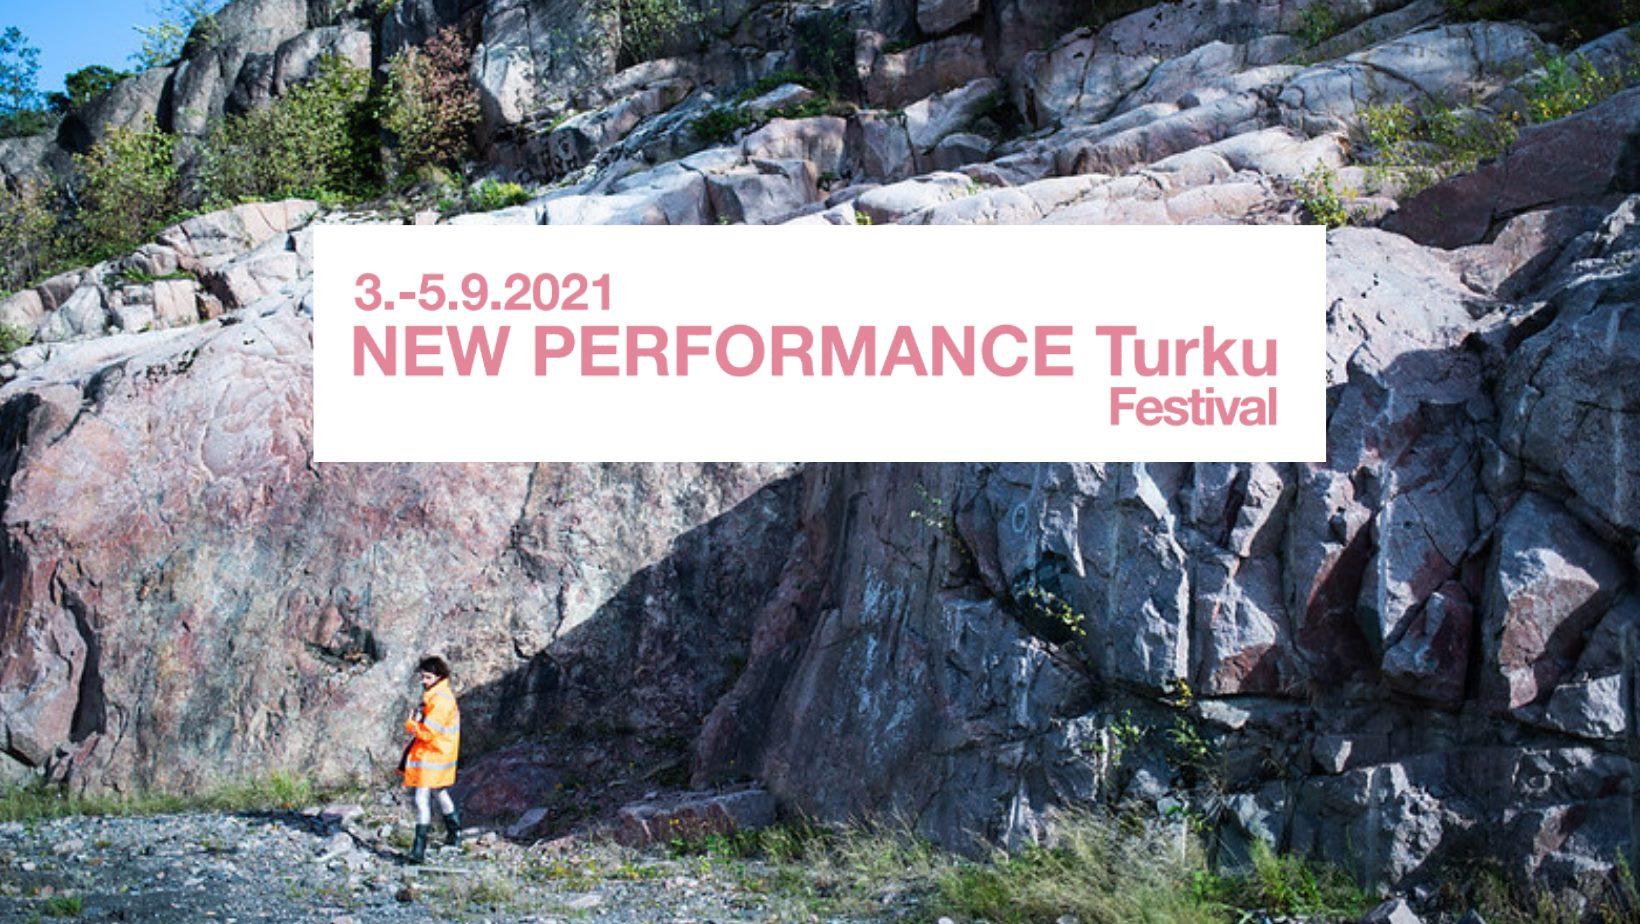 New performance turku festivaalin banneri